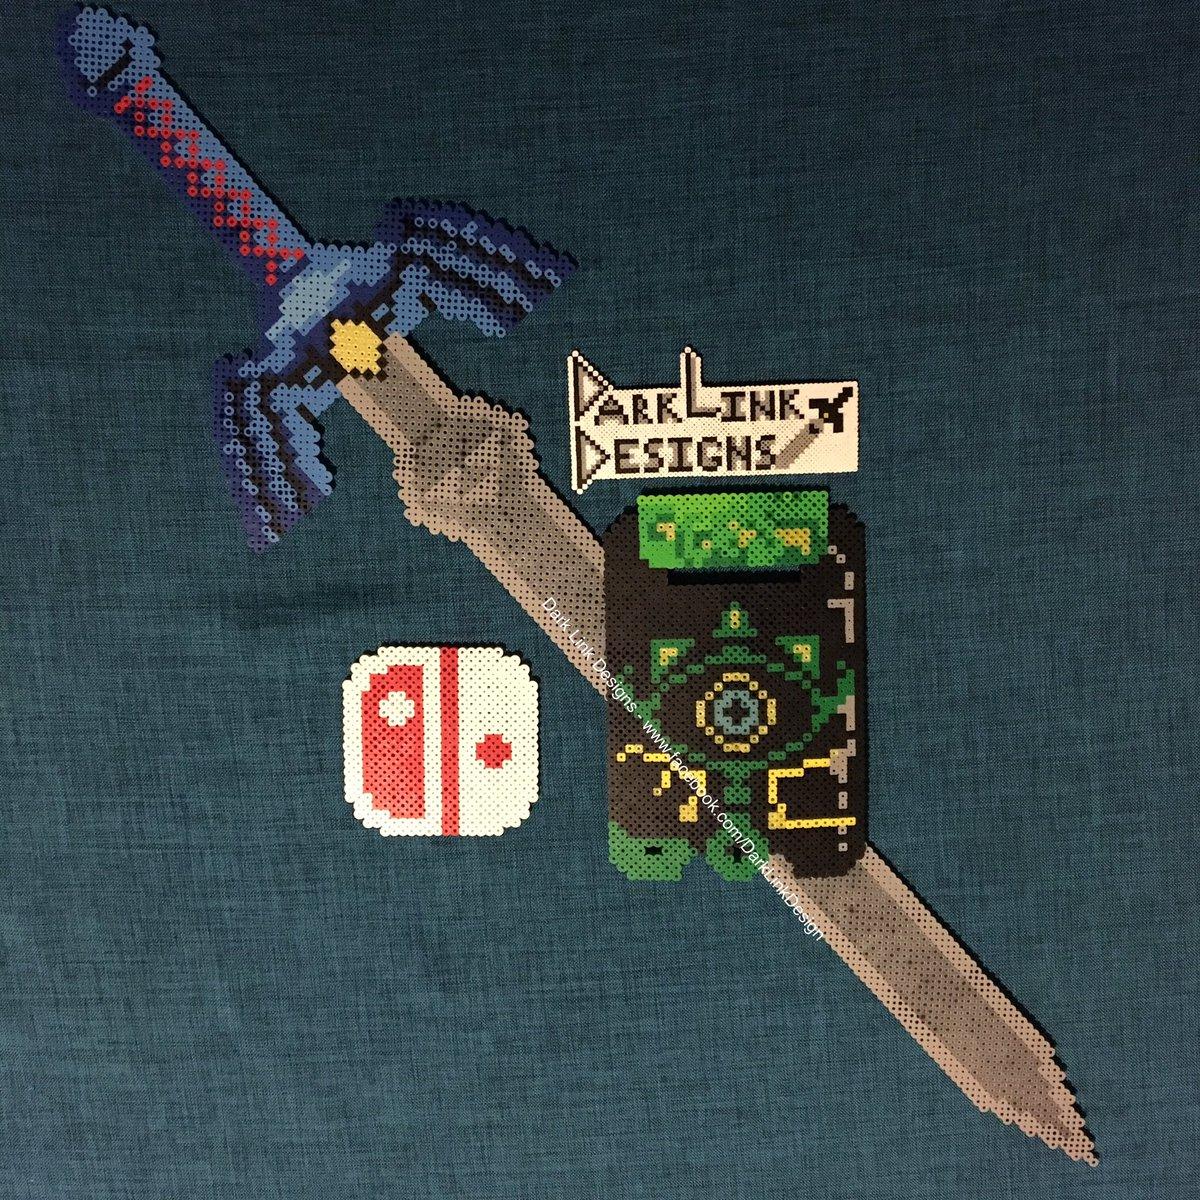 Dark Link Designs On Twitter 03 03 2017 Nintendoamerica Switch And The Legend Of Zelda Breath Of The Wild Are Released Pixel Perlerbeads Kitchener Darklinkdesigns Https T Co Whhqzdscyp